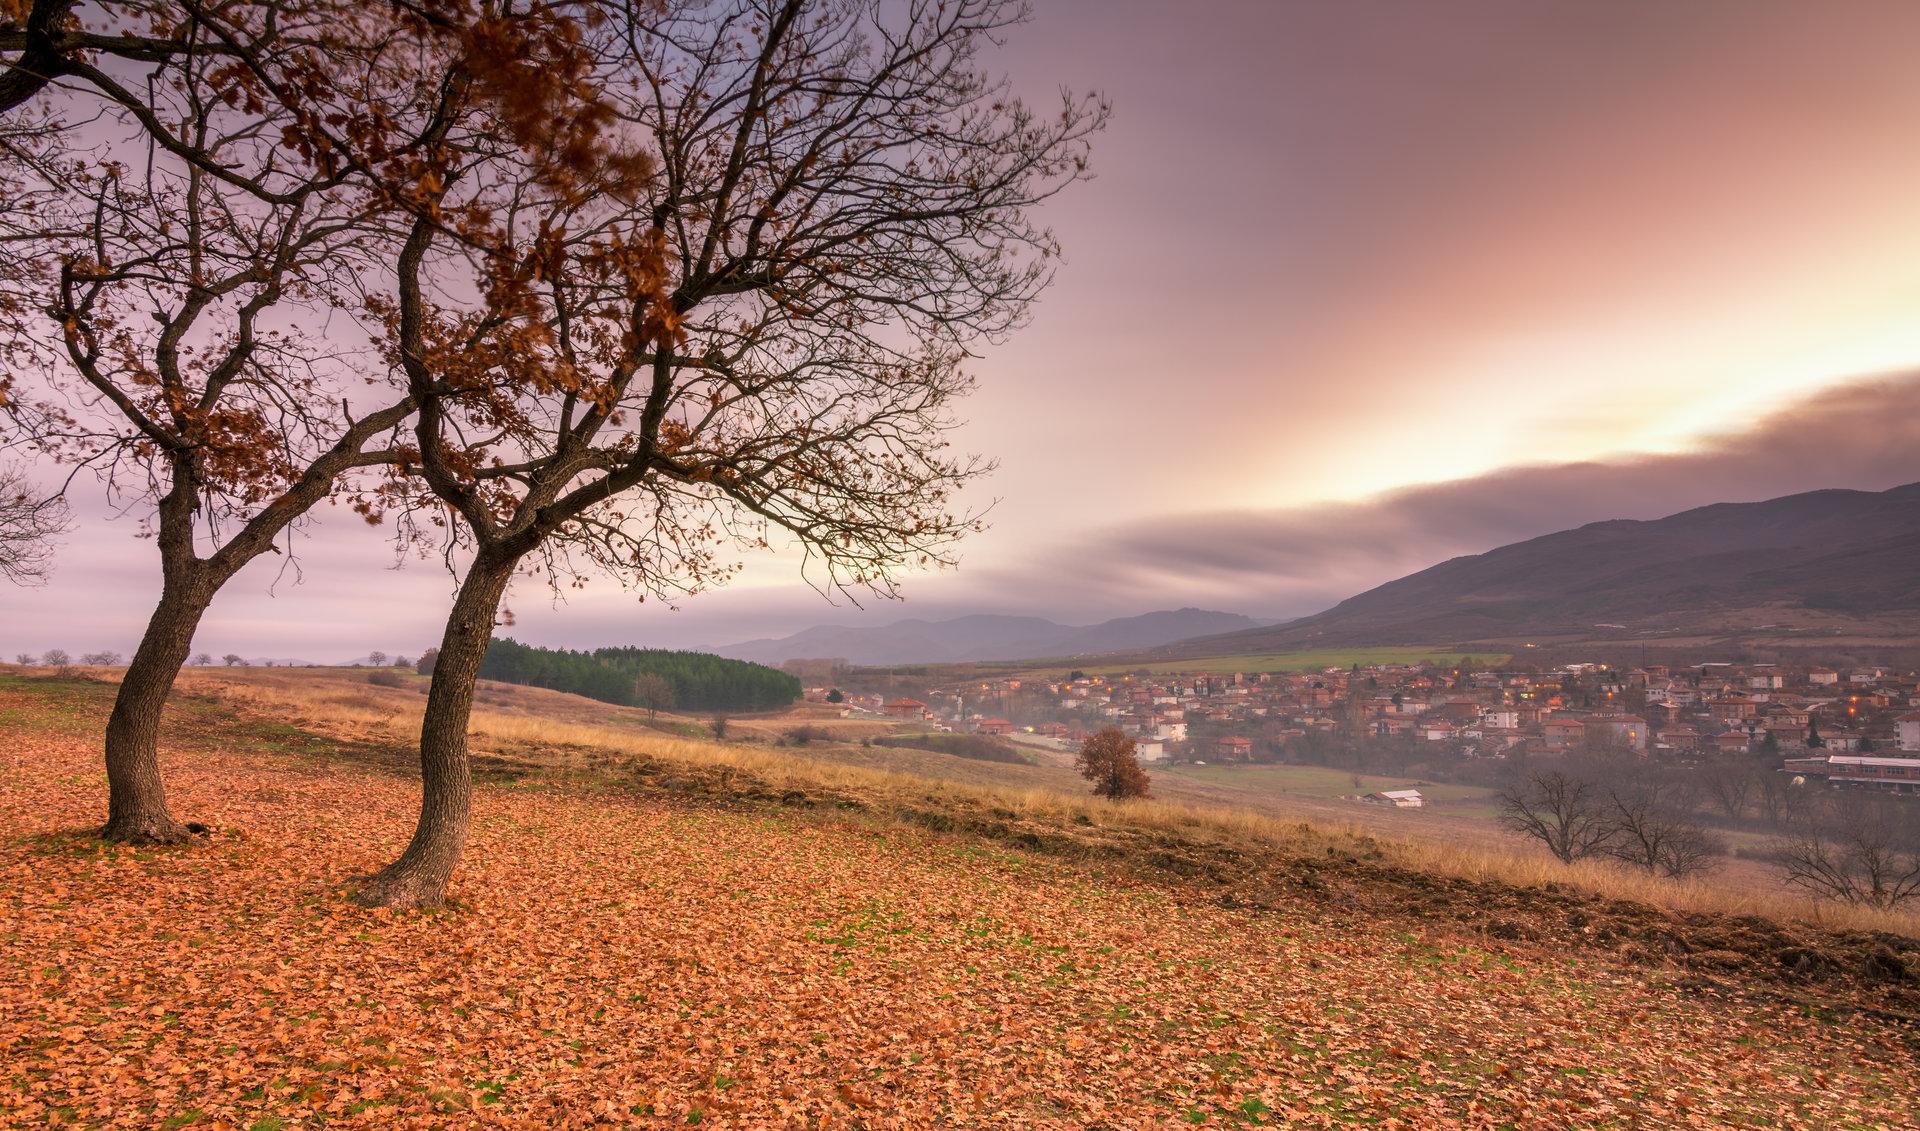 Photo in Landscape | Author tanchevski | PHOTO FORUM